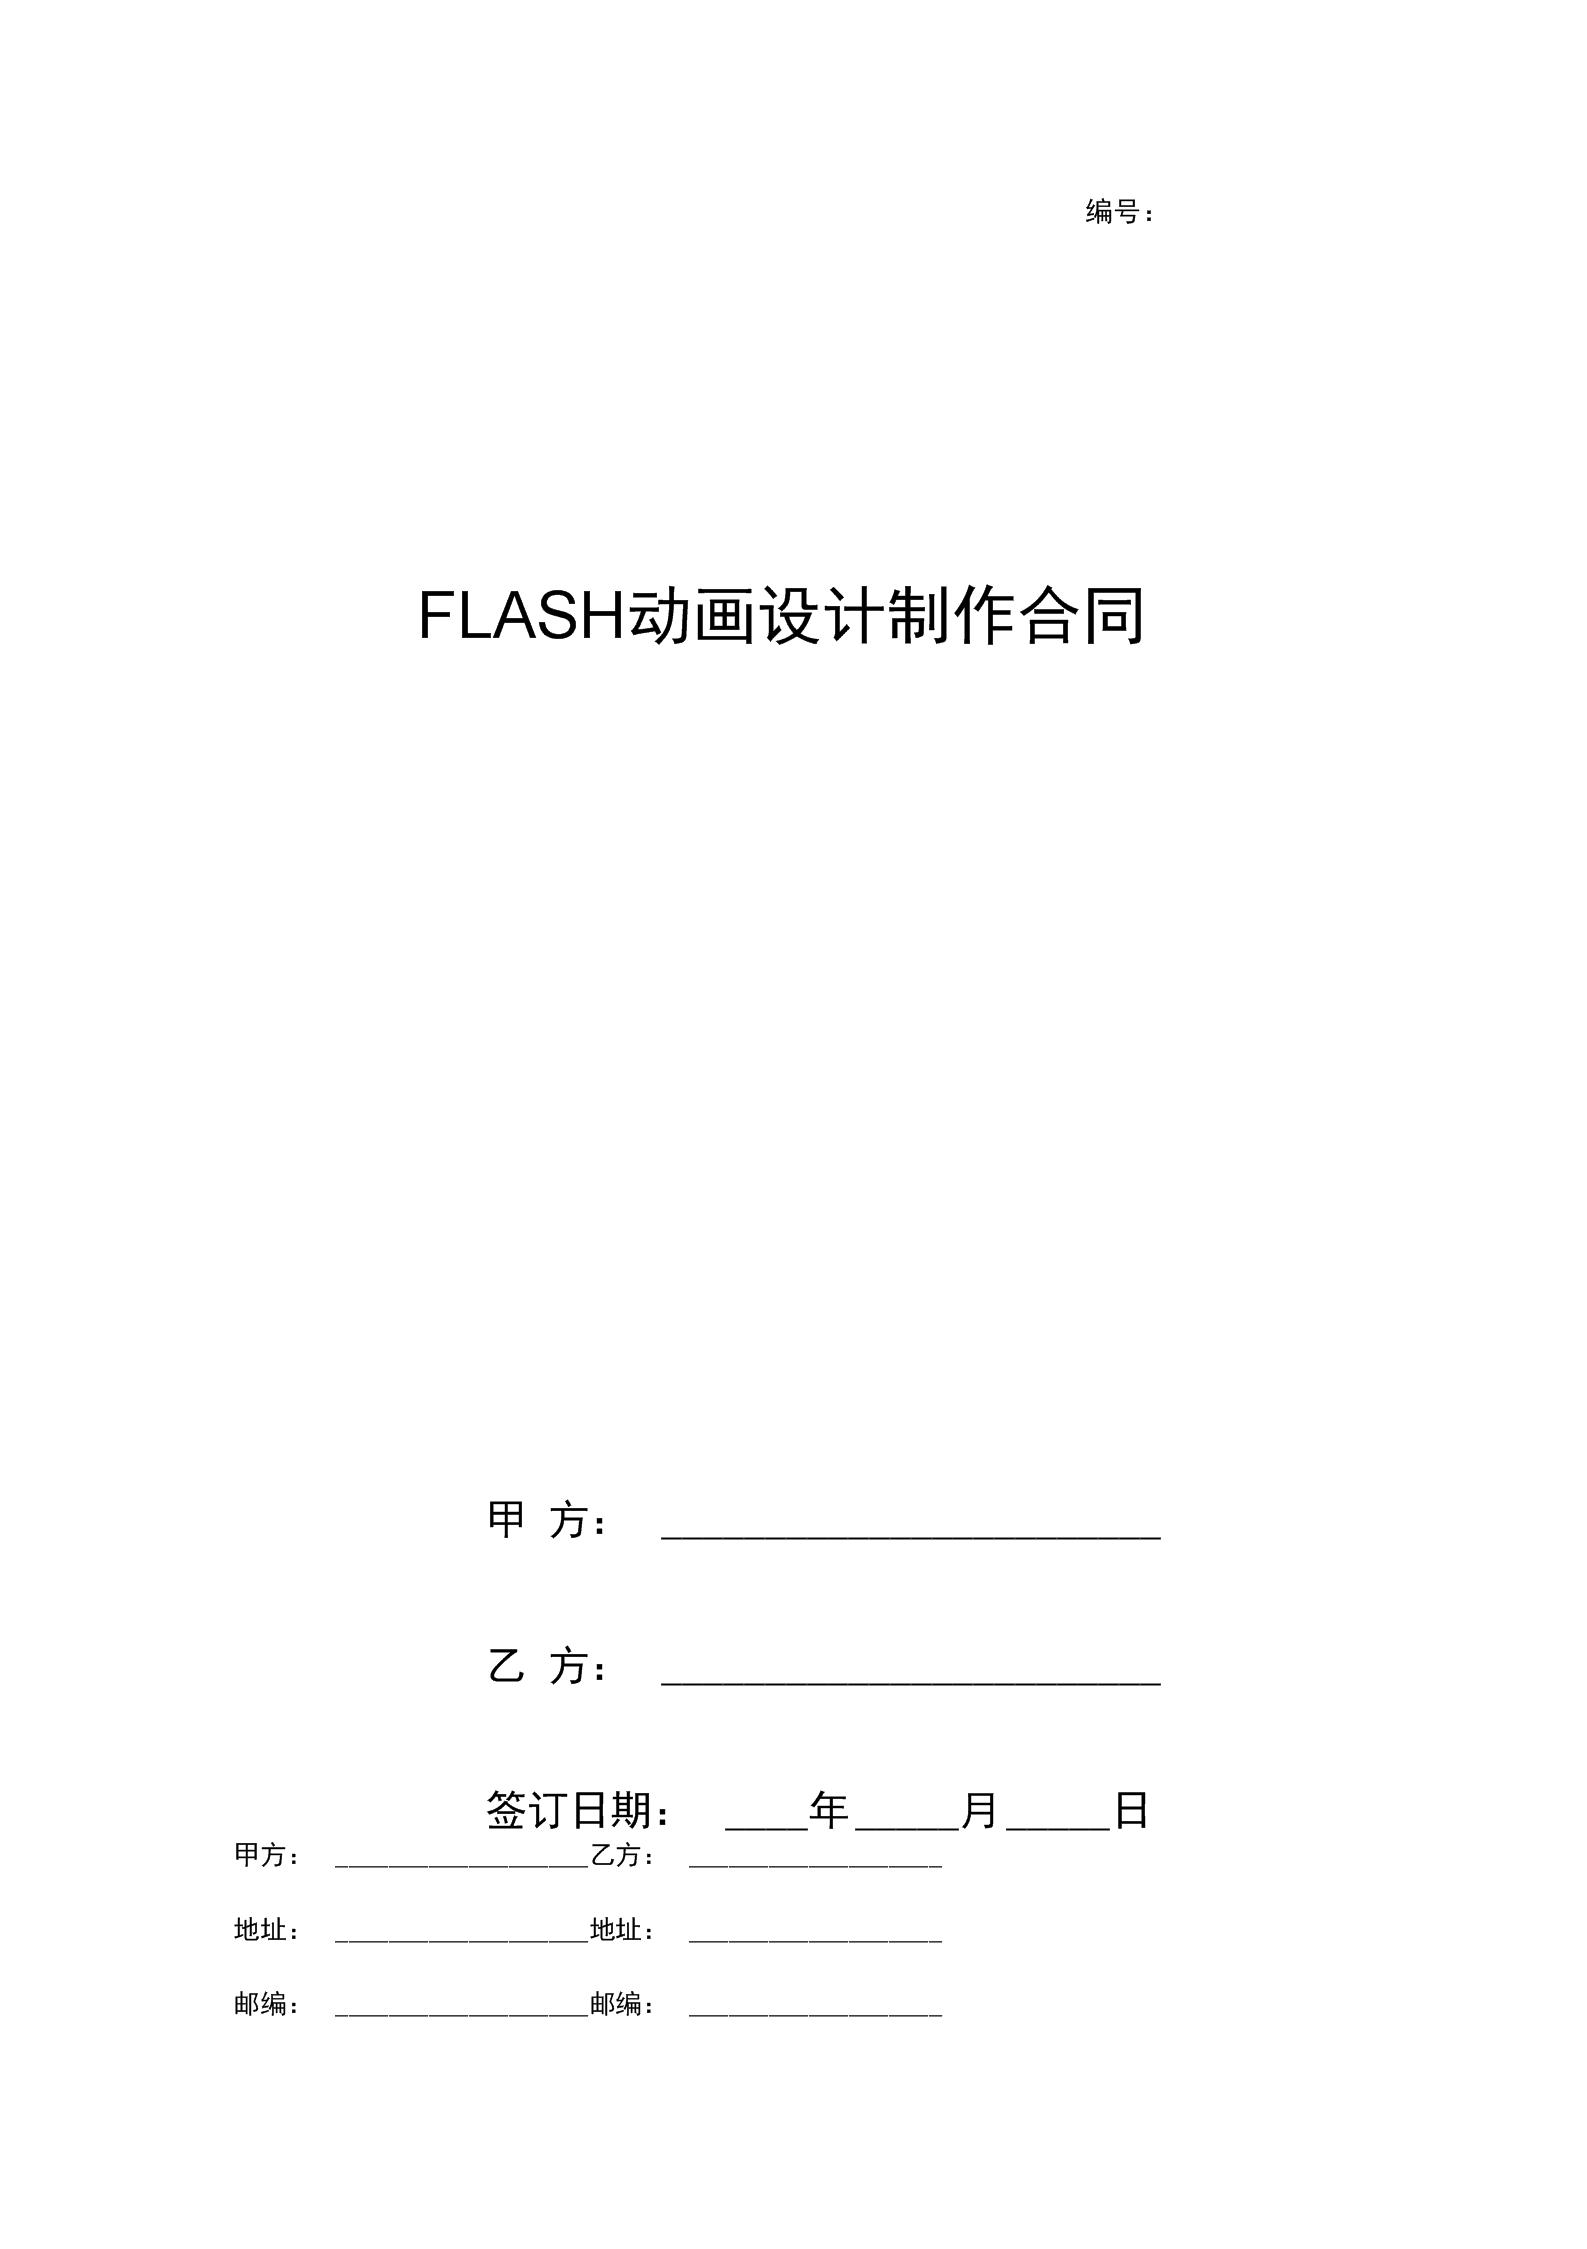 FLASH动画设计制作合同.docx